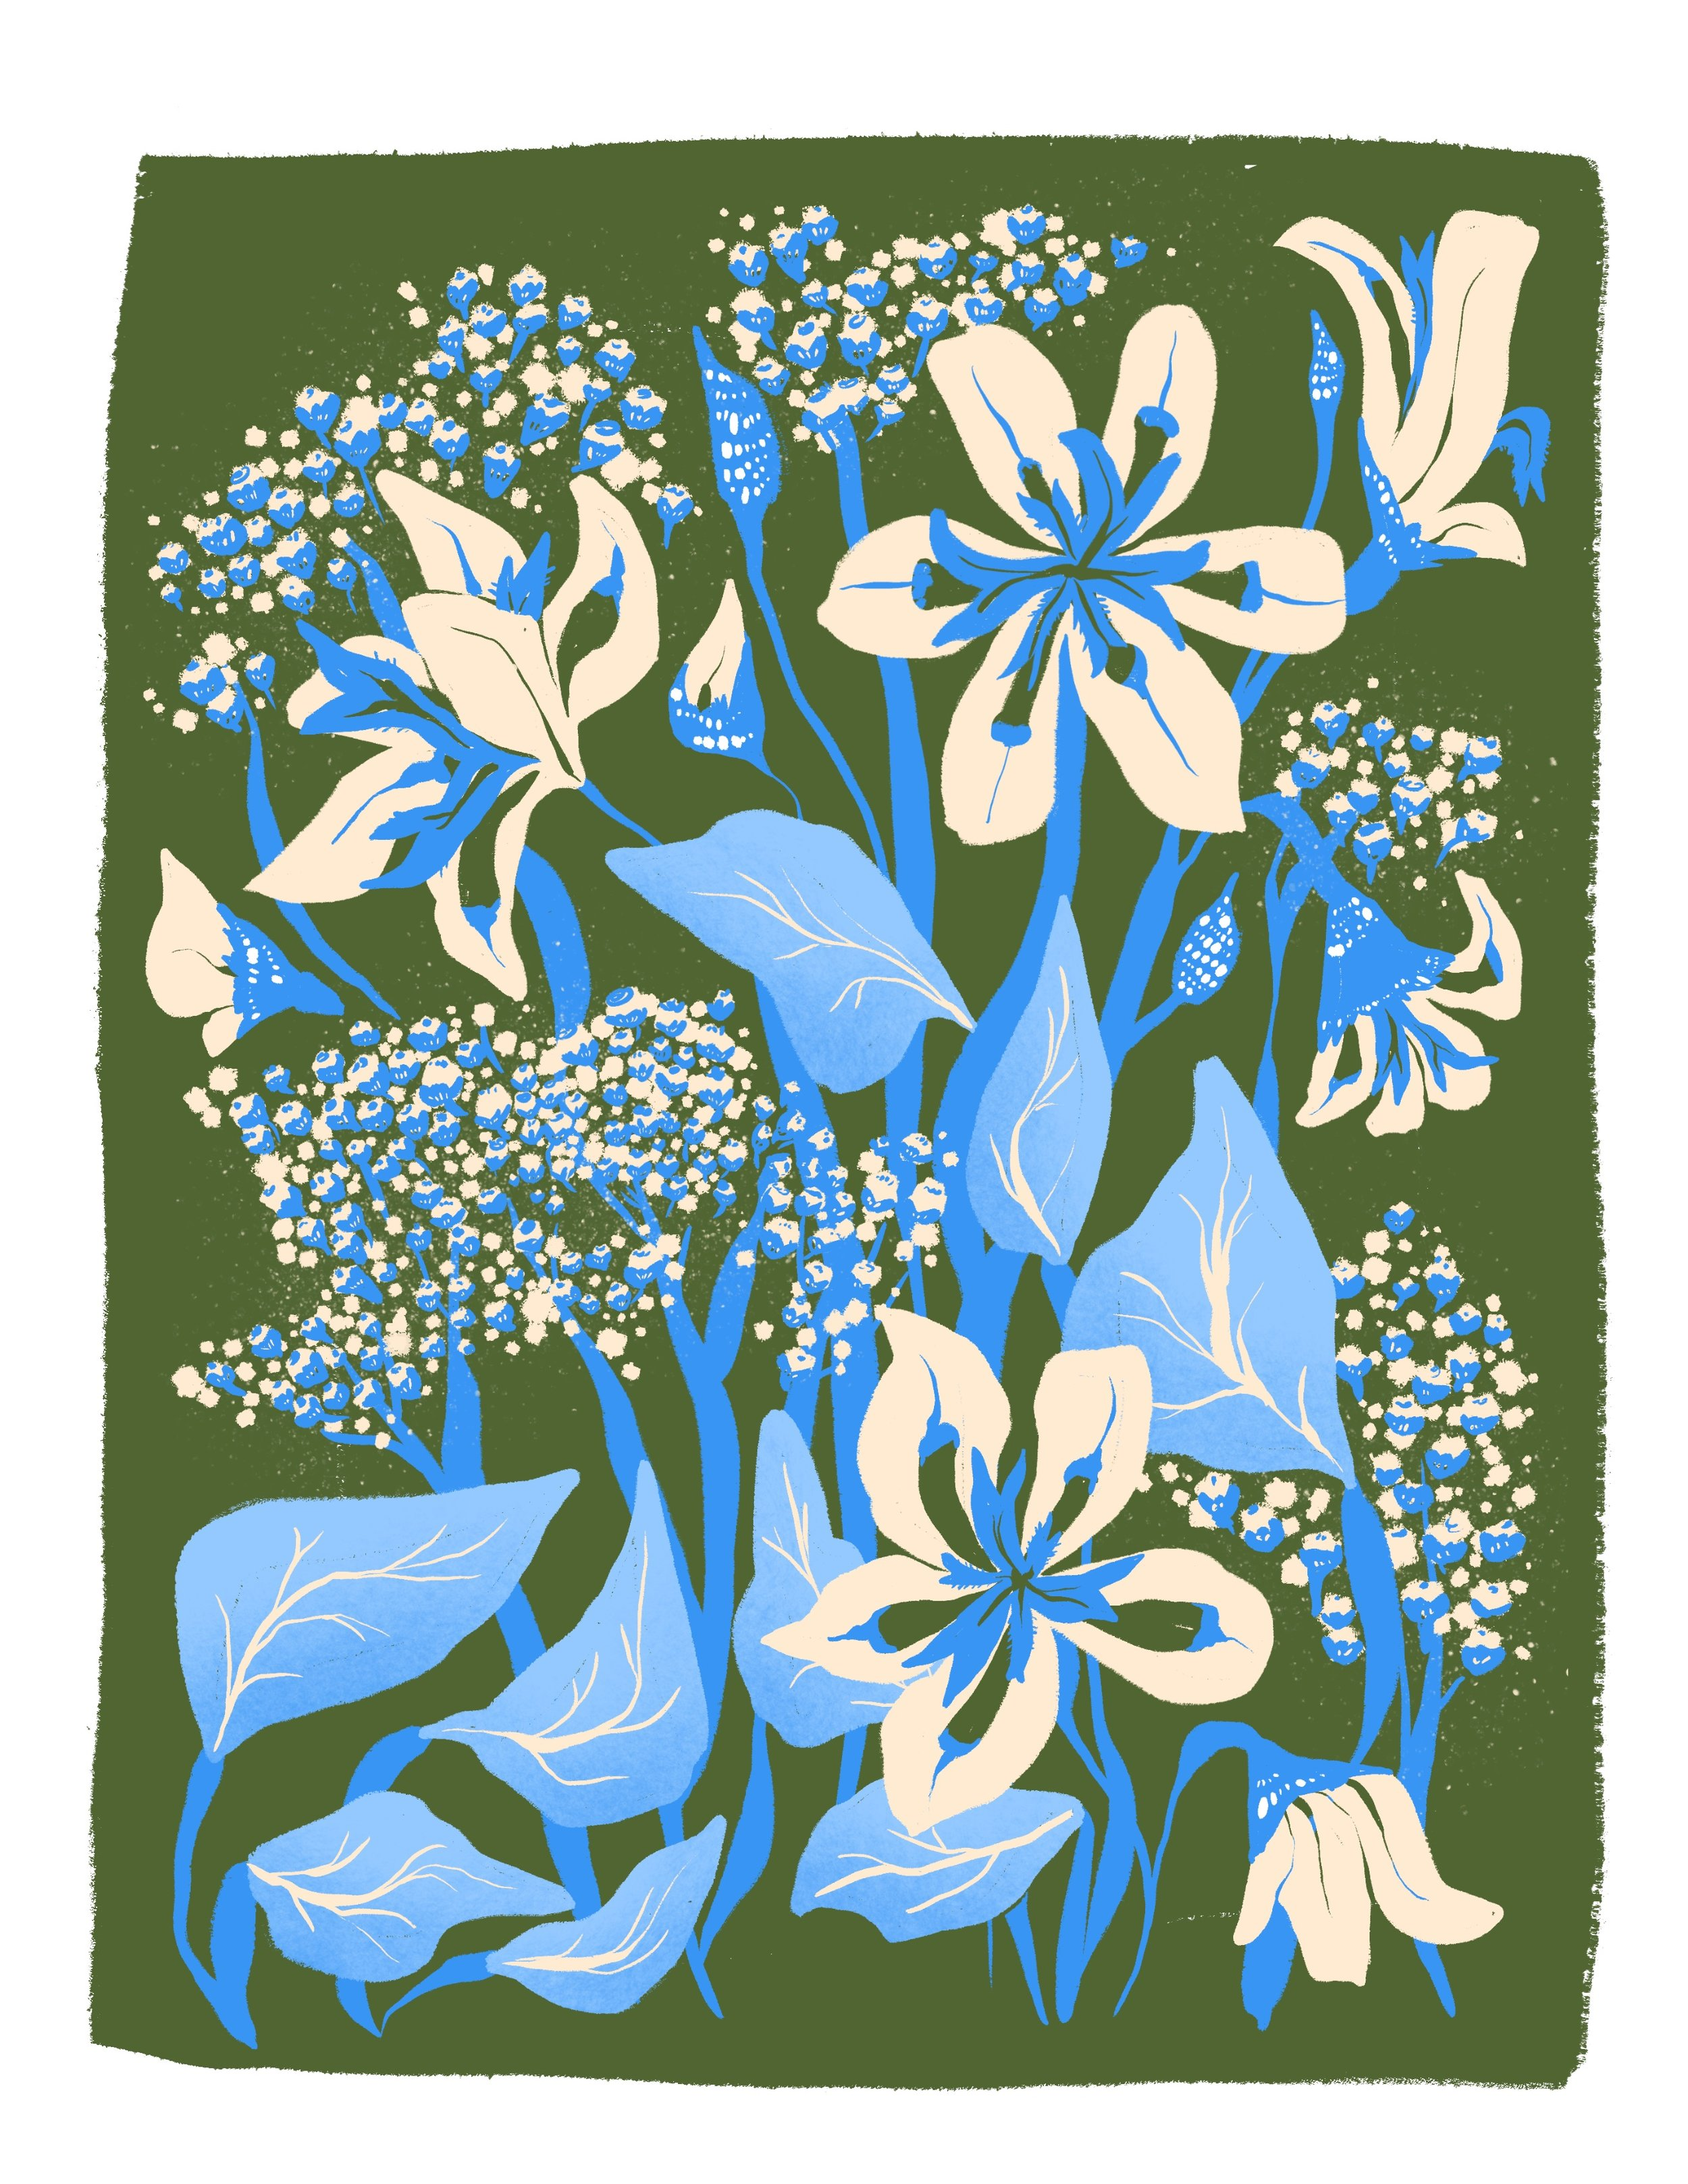 190801_disney flowers_Mallory Cohn.JPG